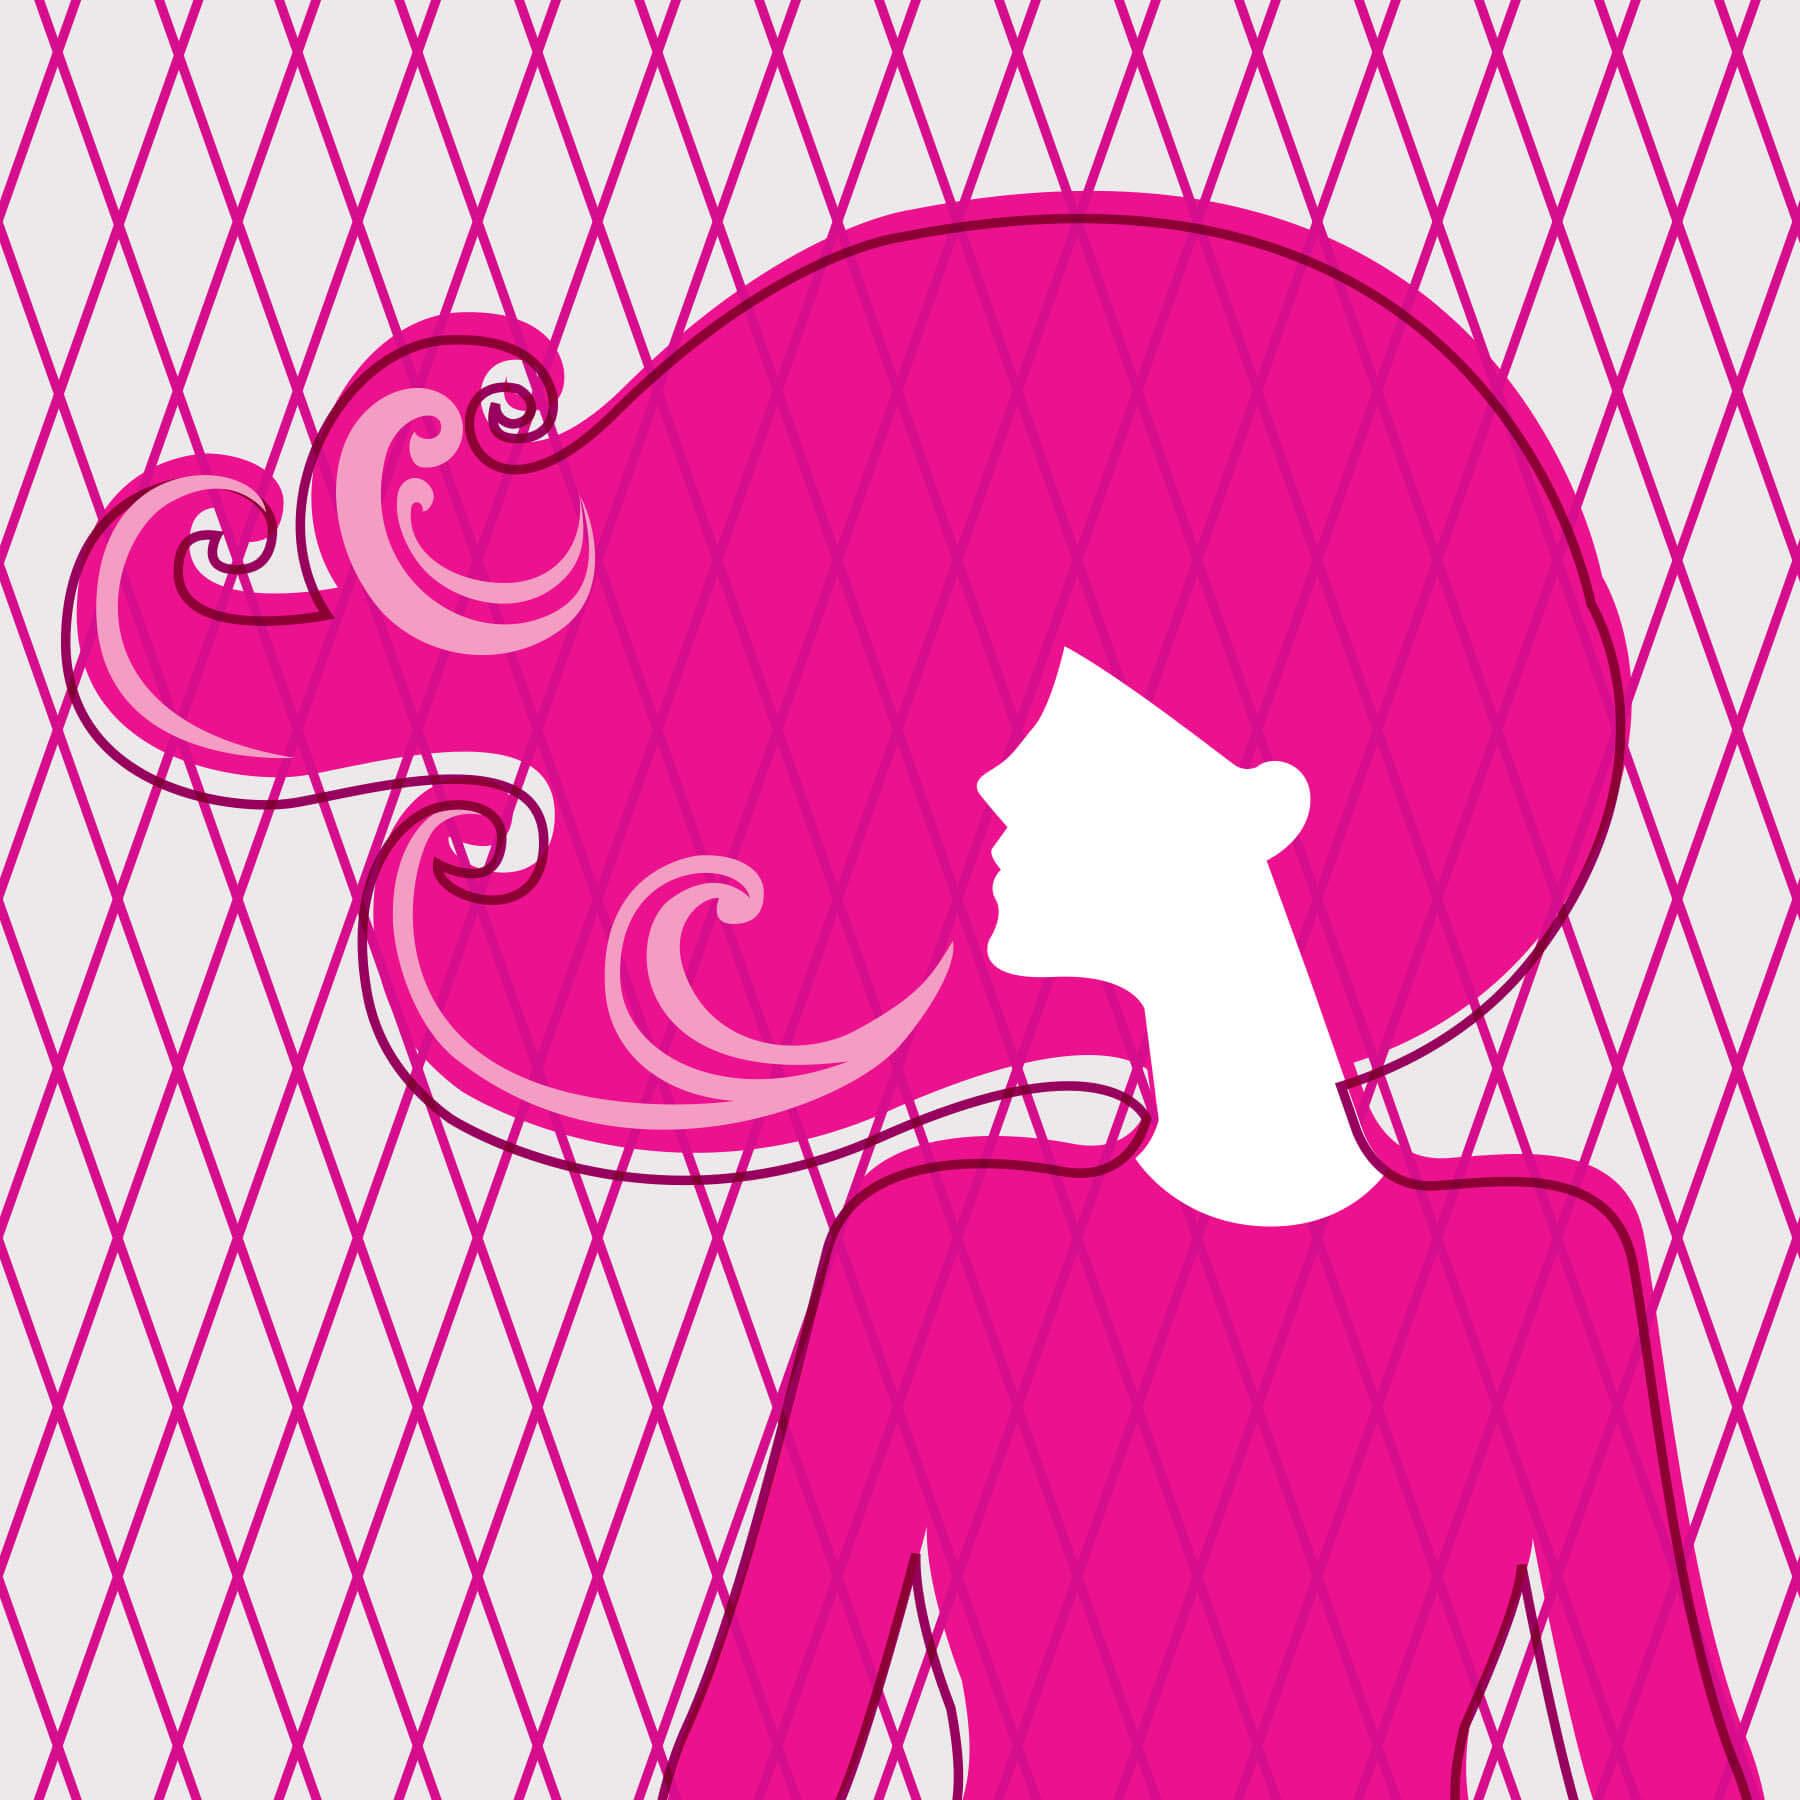 Aqua Net Woman Illustration